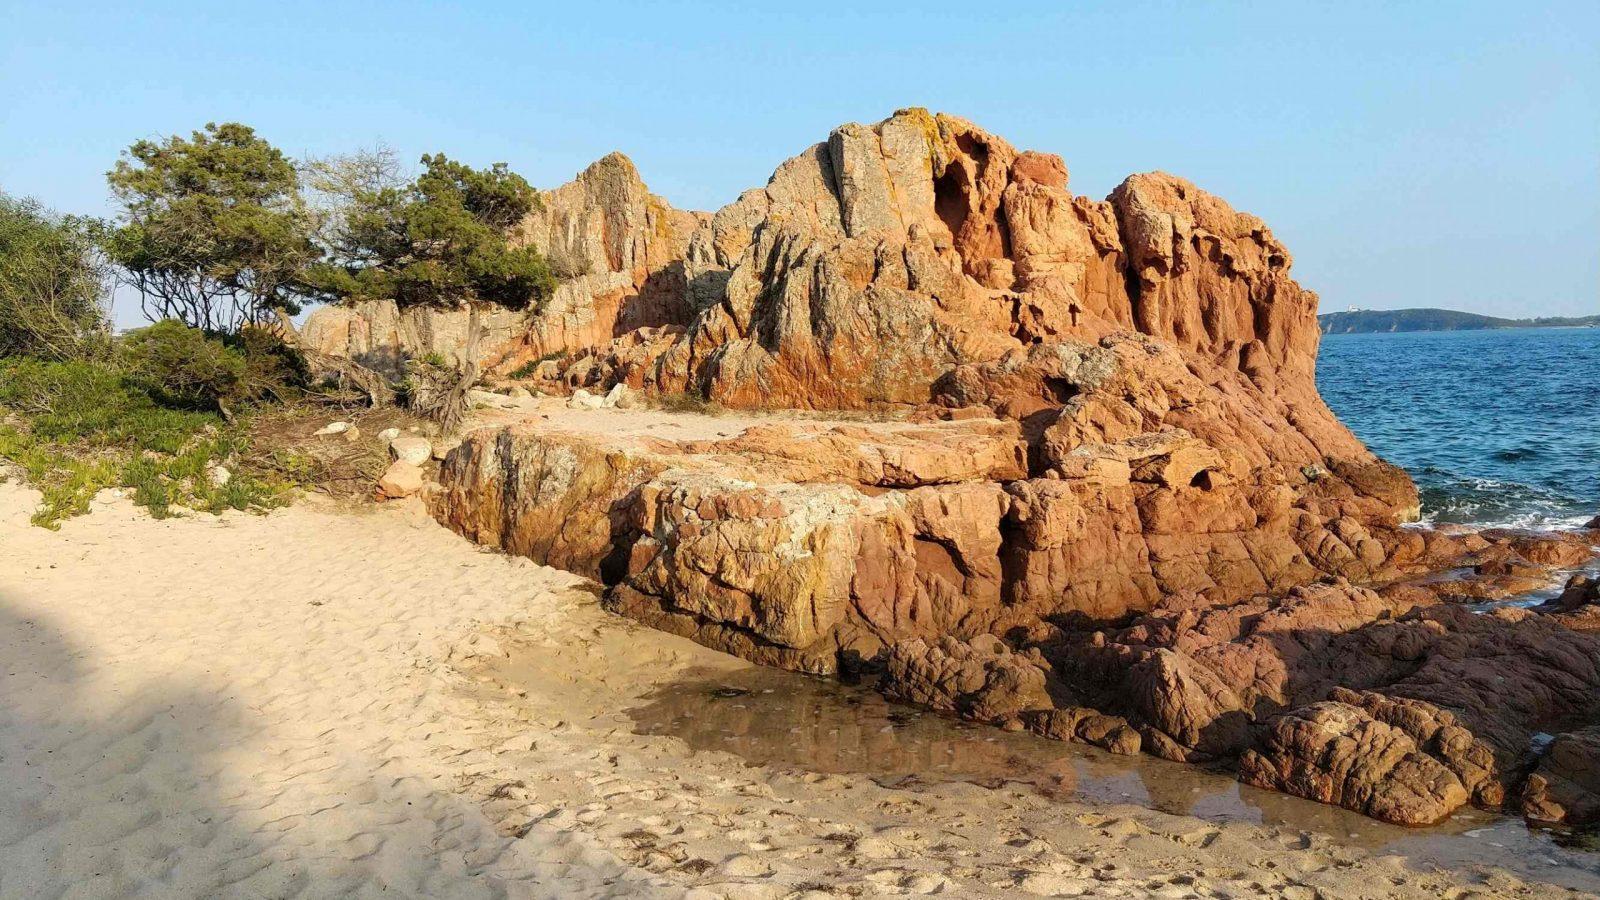 Plaže južne Korzike